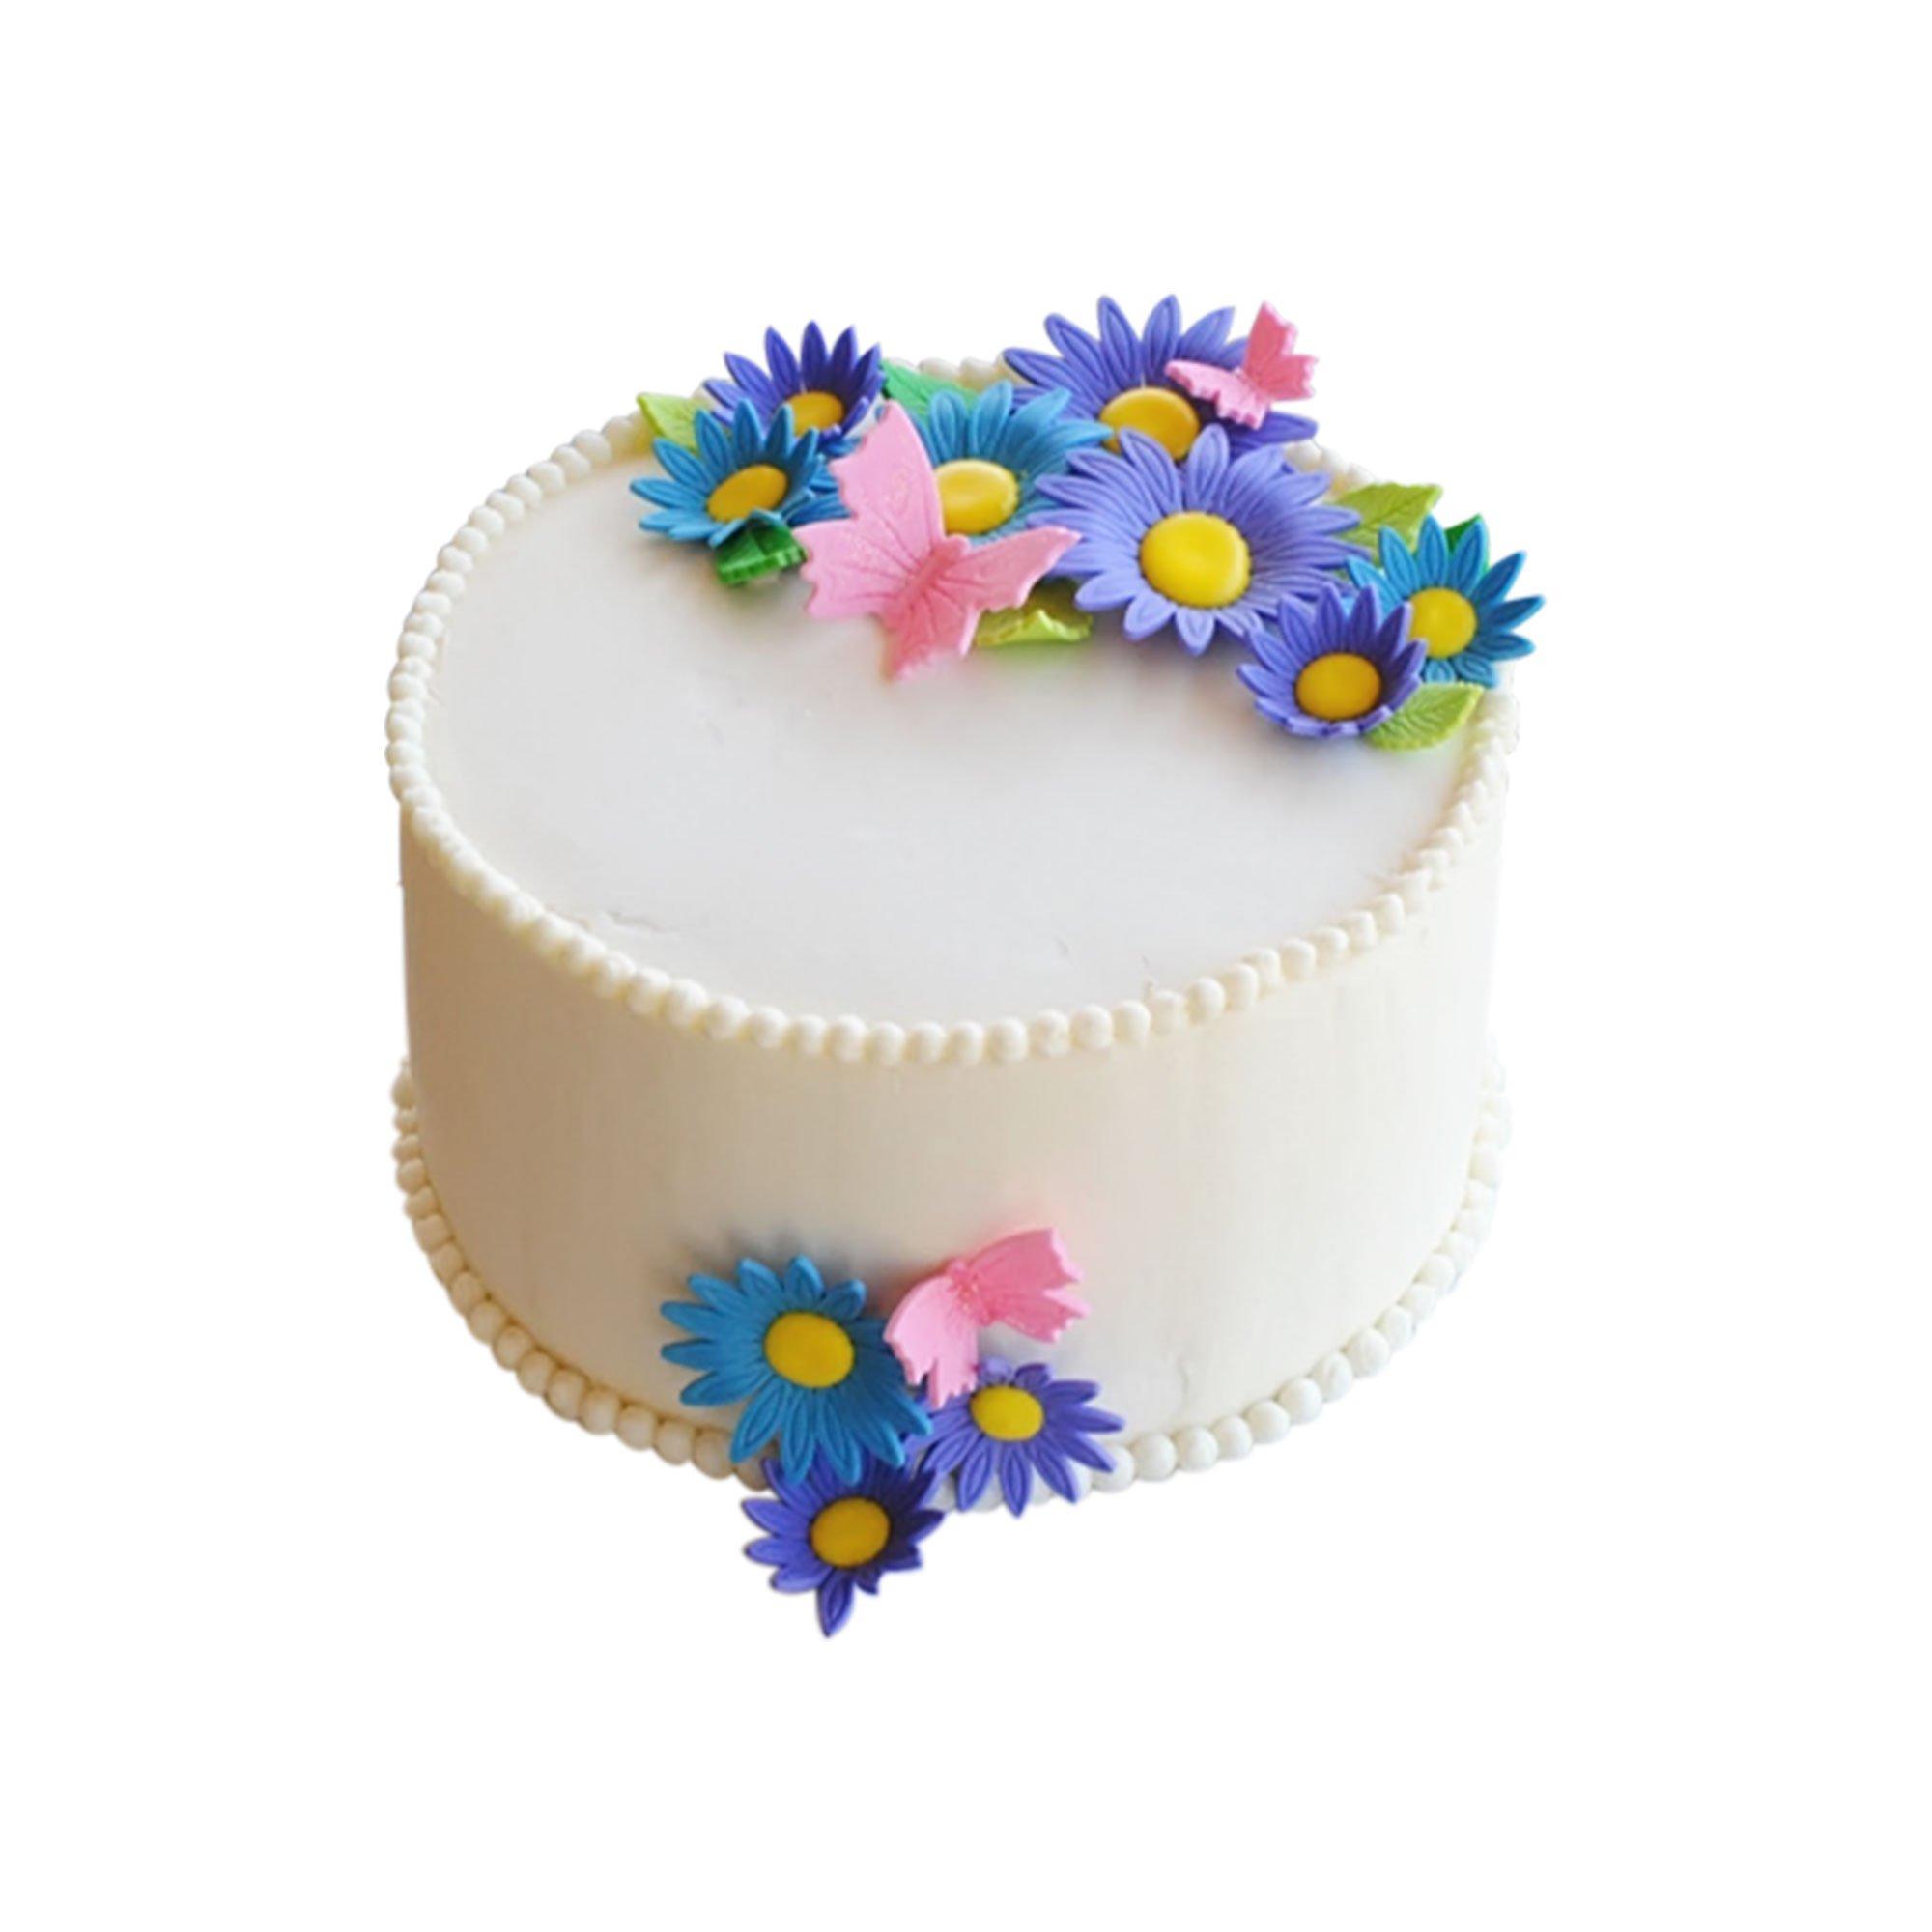 Simple Flower Cake Daybyday Lk